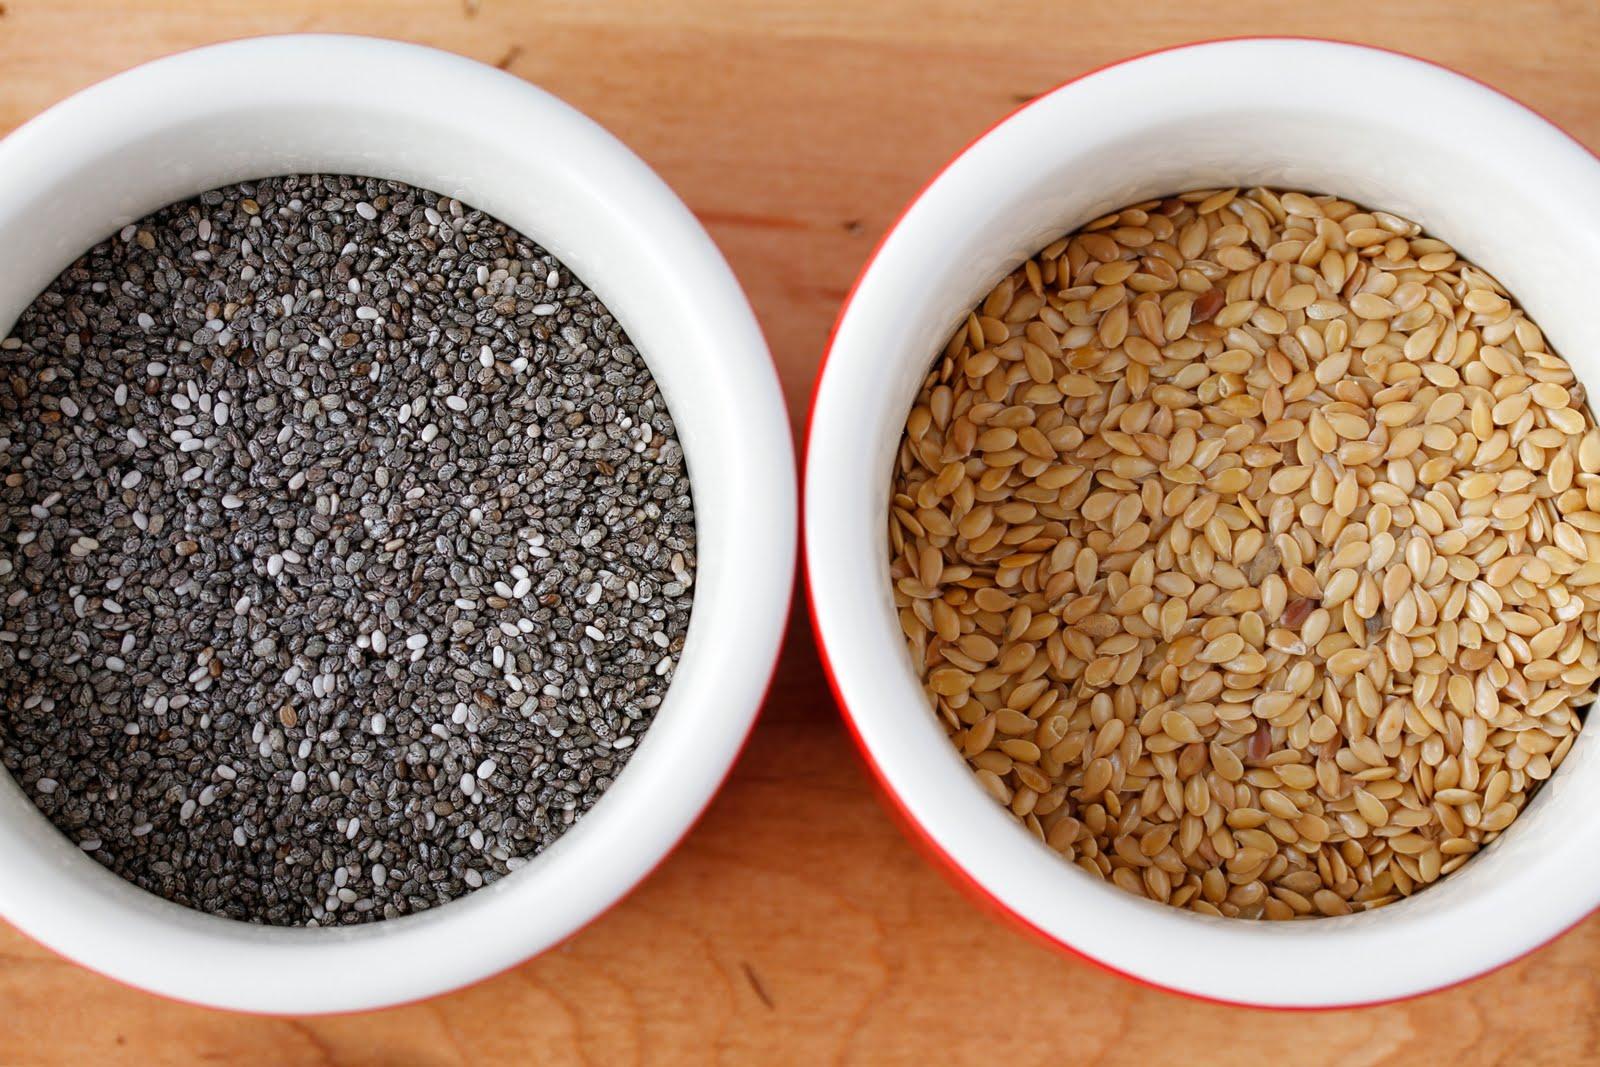 Chia seeds flax seeds